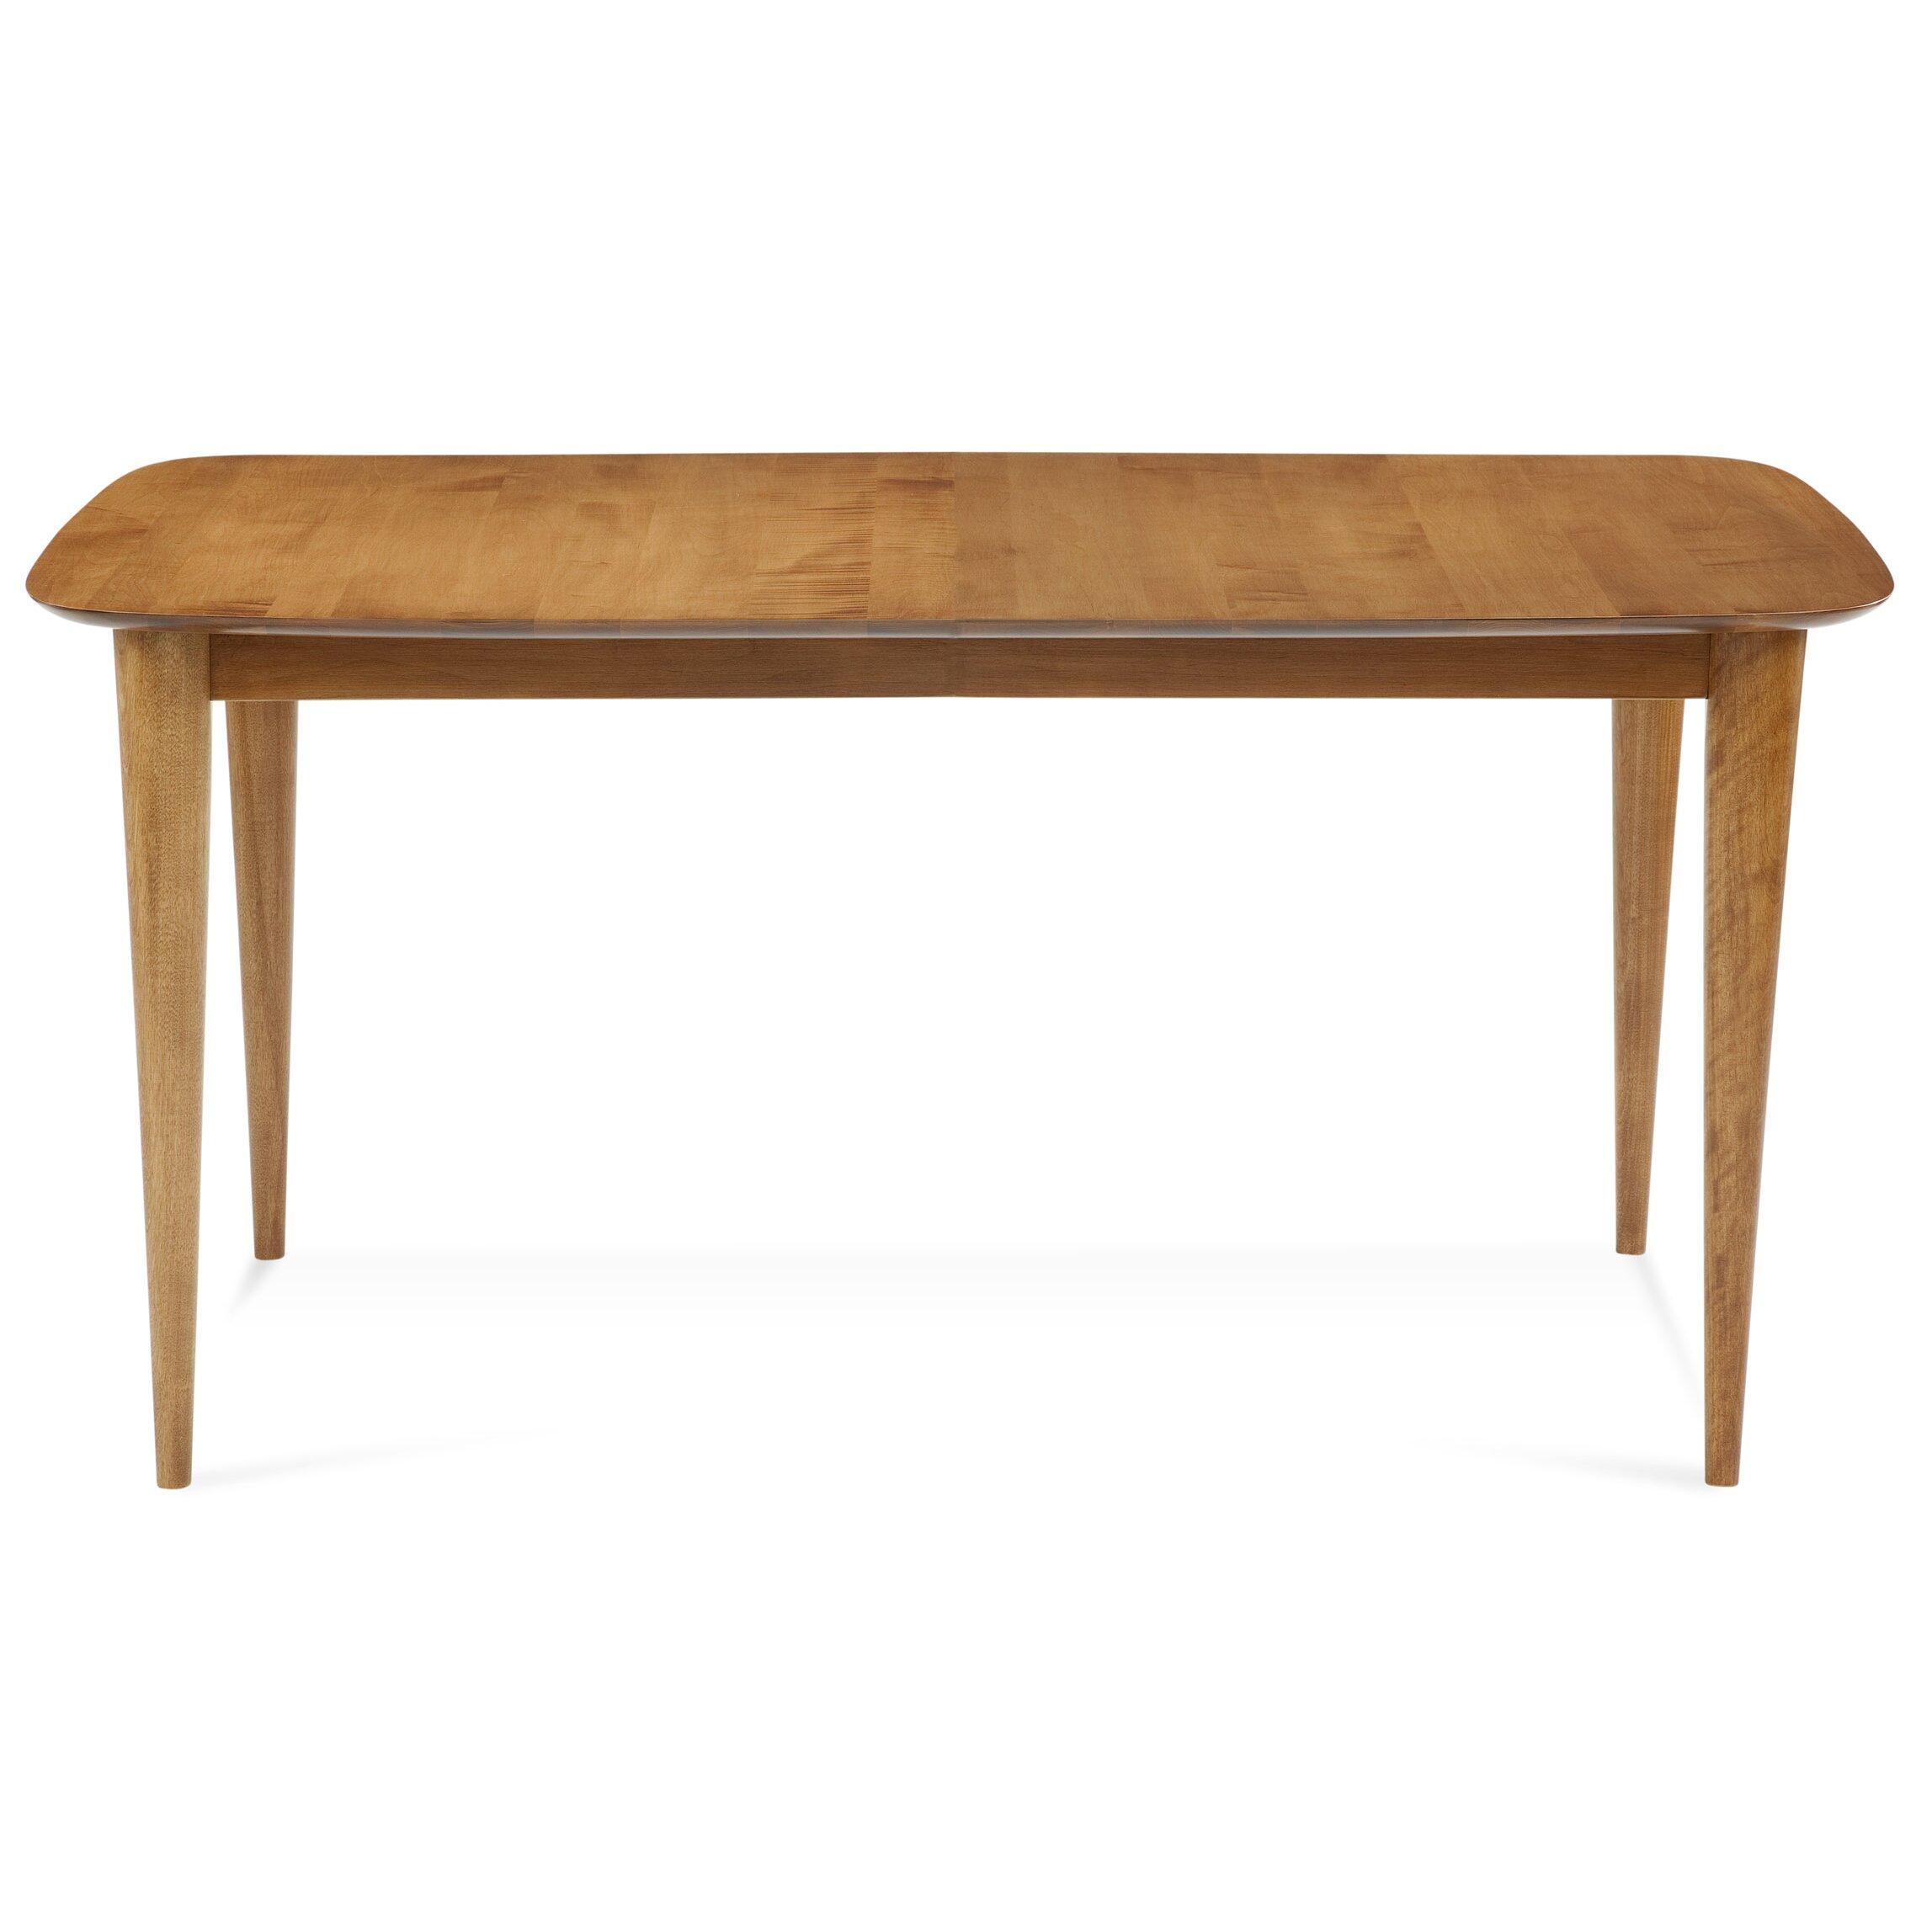 Saloom Furniture Cona Dining Table Wayfair